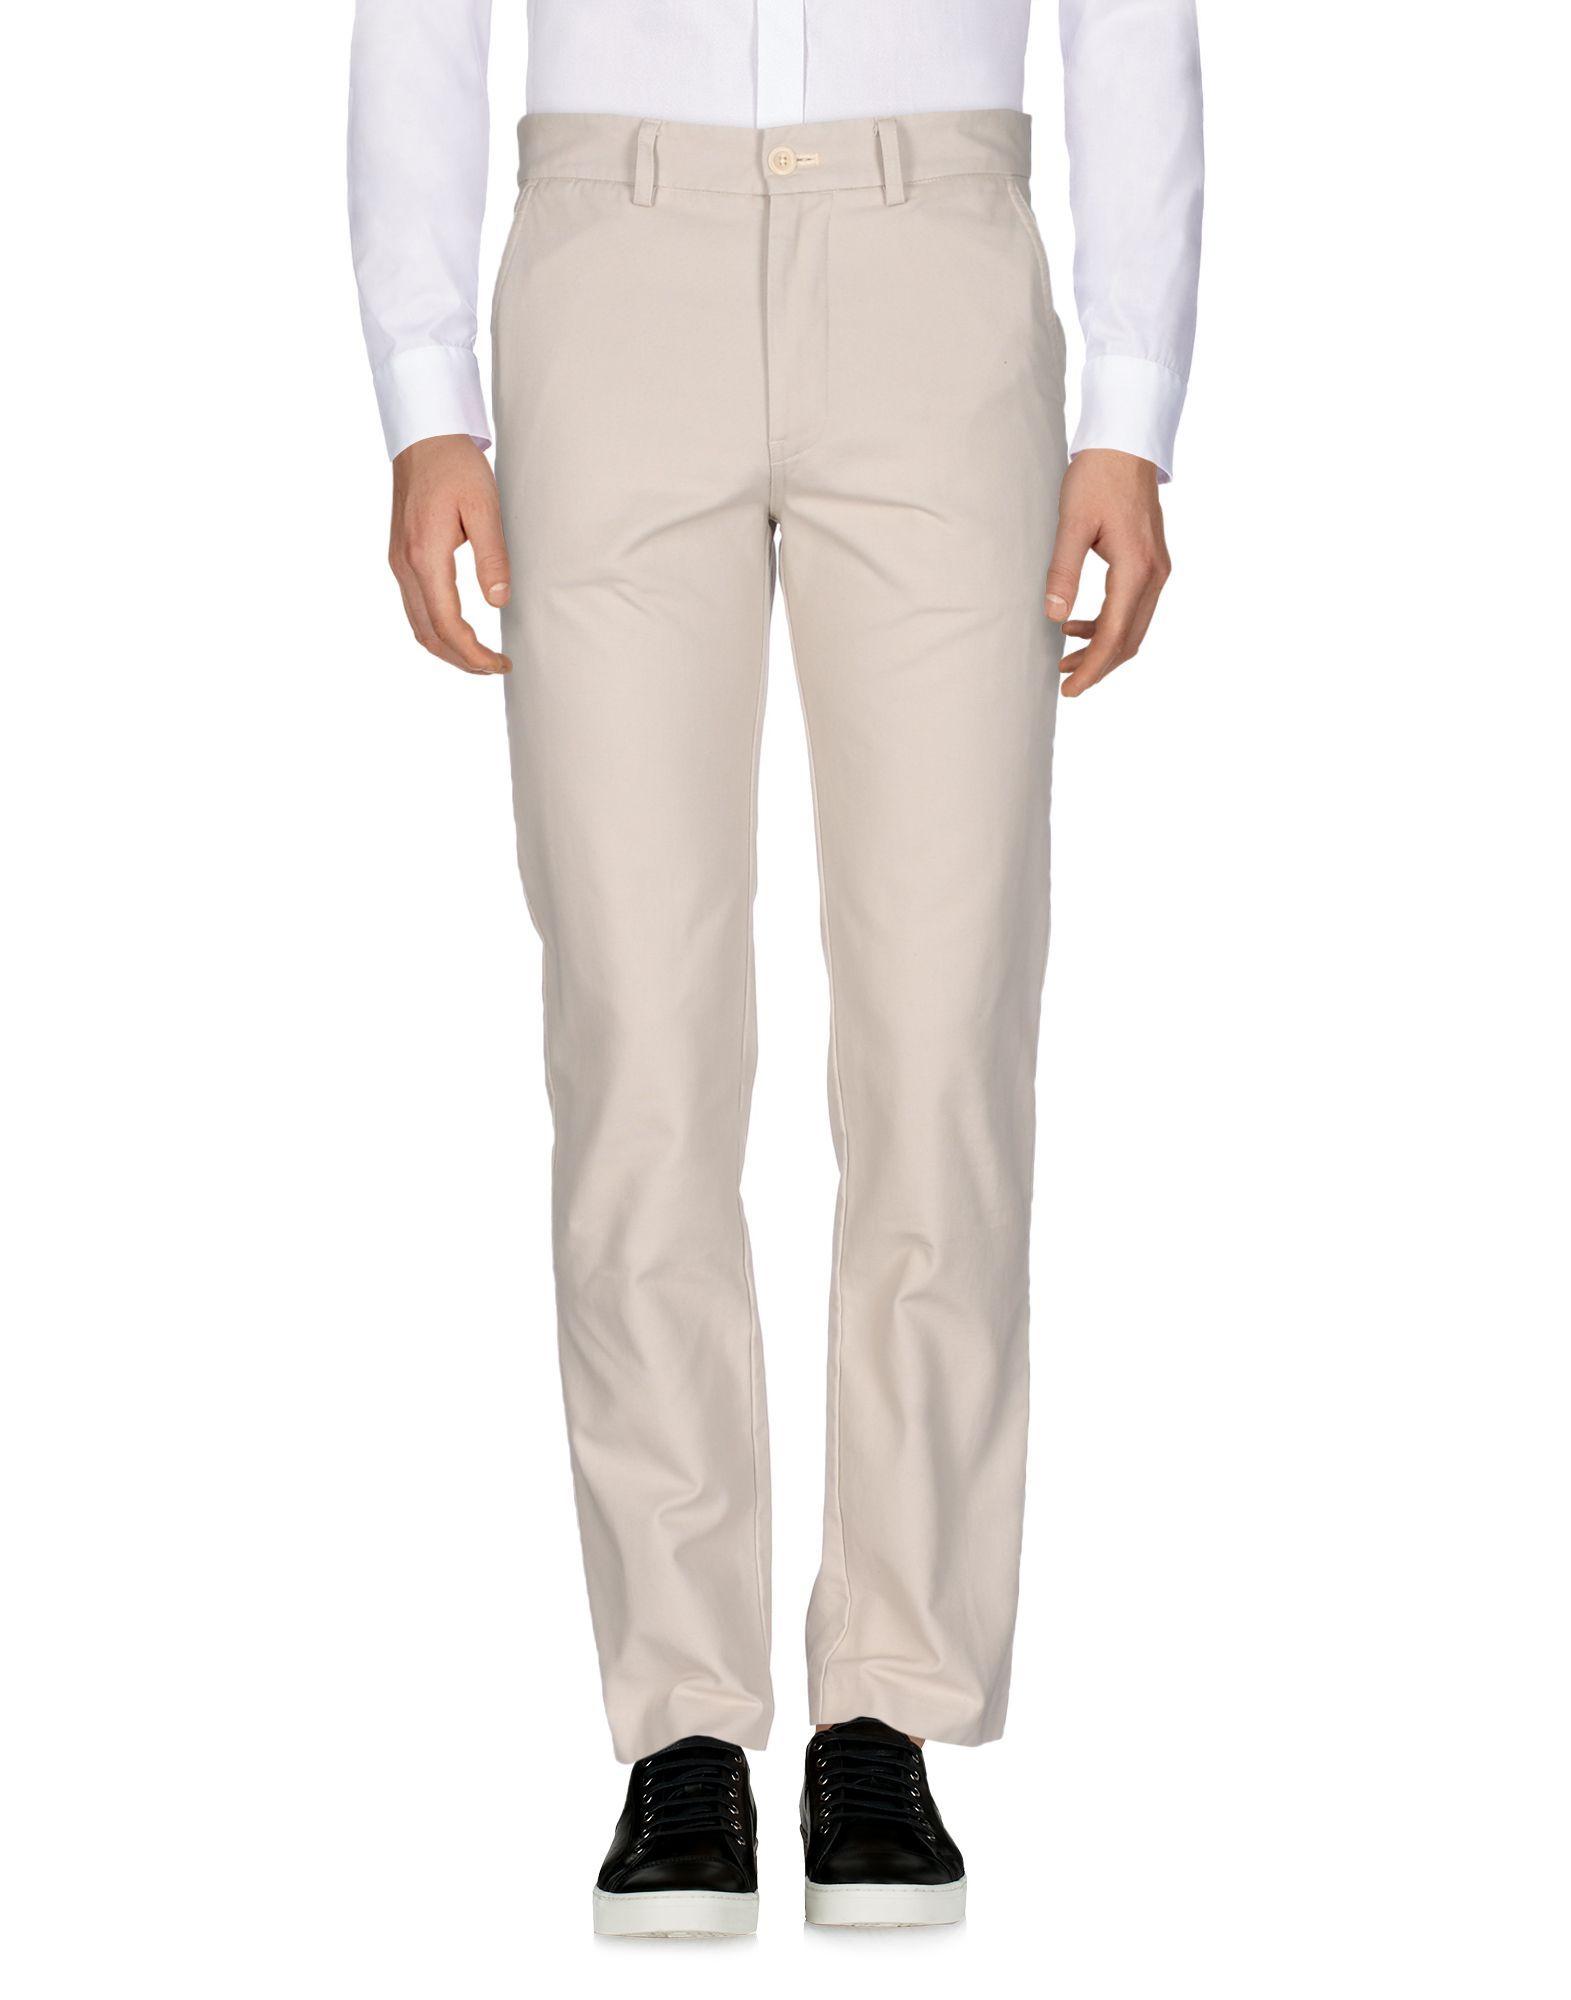 F.S.C. Freemans Sporting Club Light grey Cotton Pantaloni